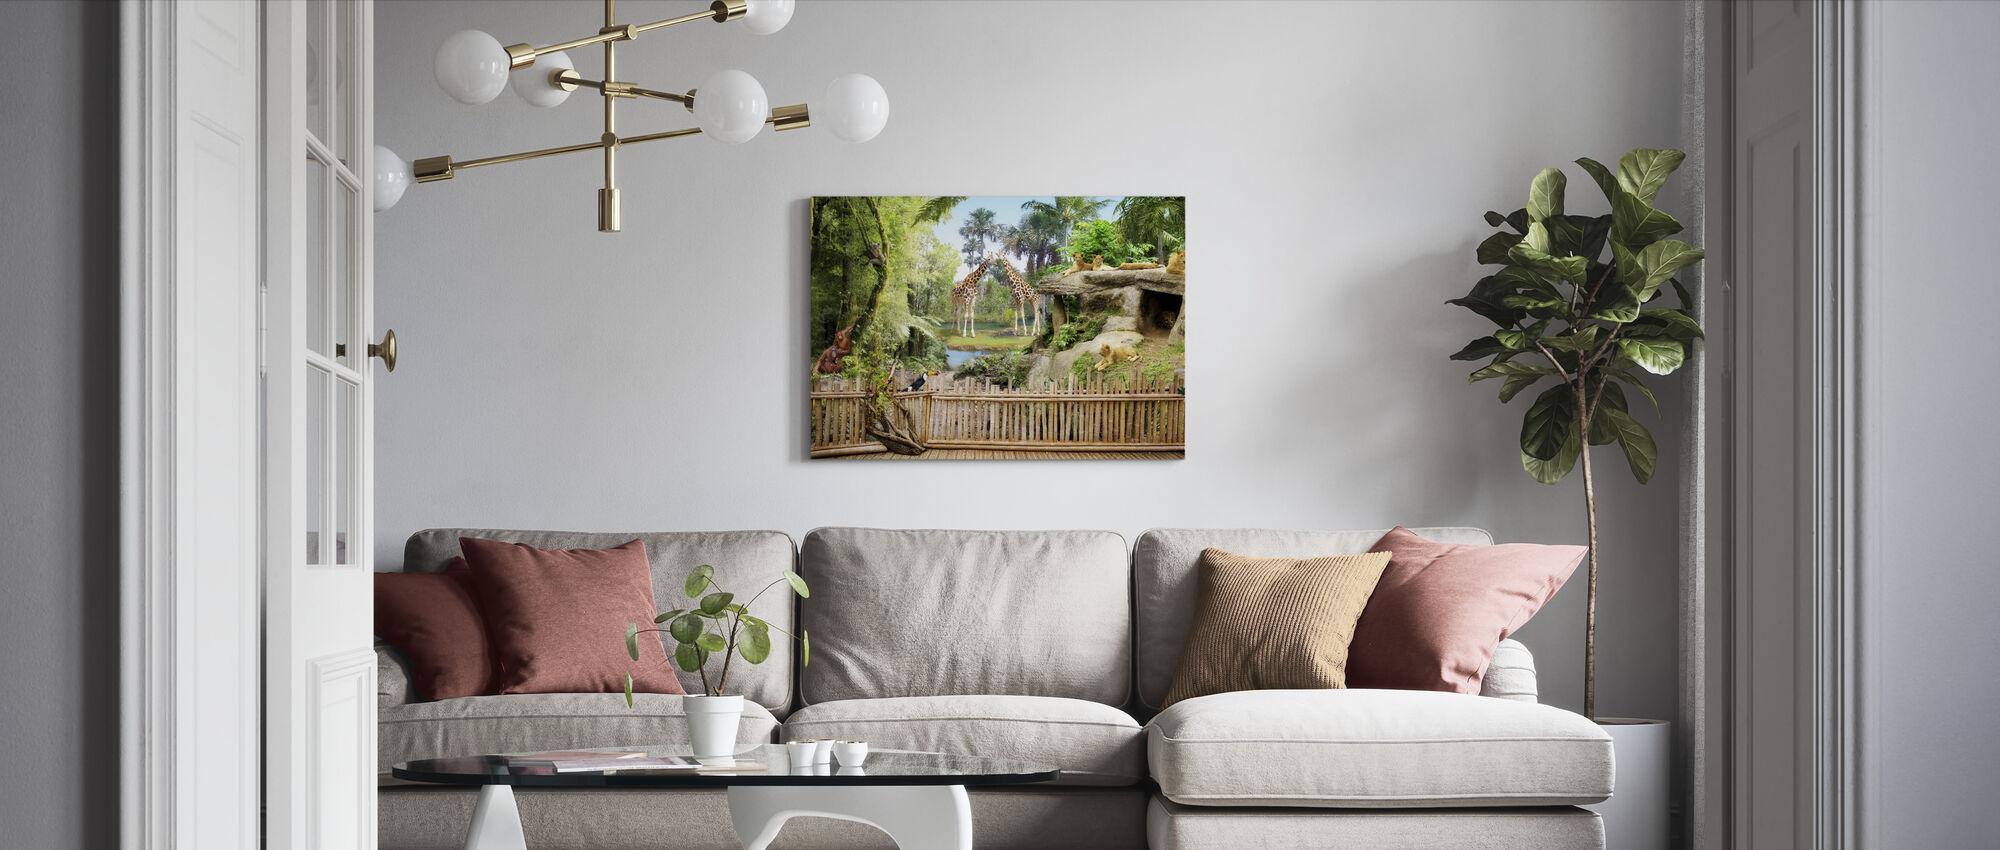 Zoo Animals - Canvas print - Living Room